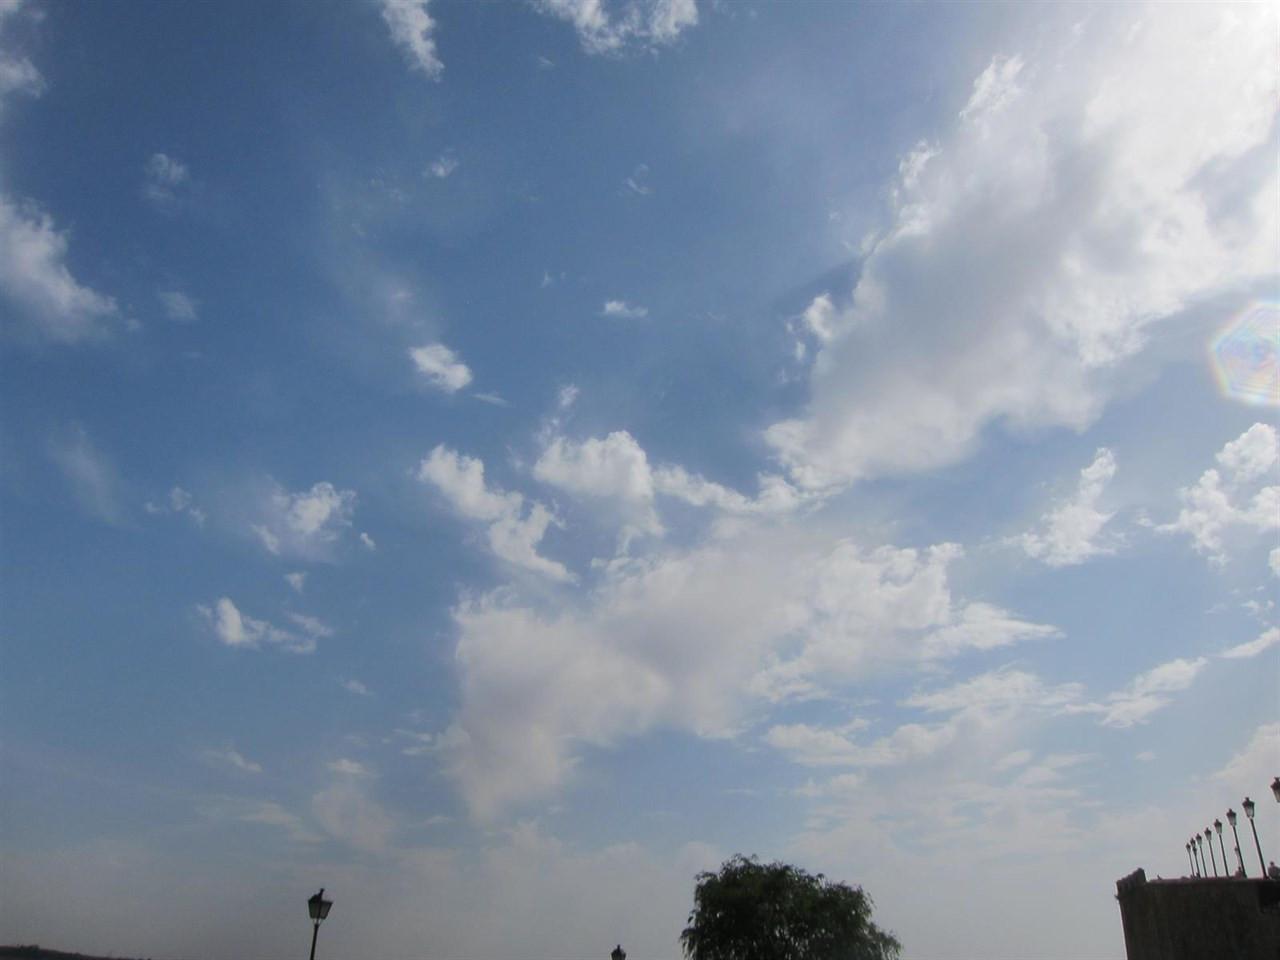 Nubesyclaros